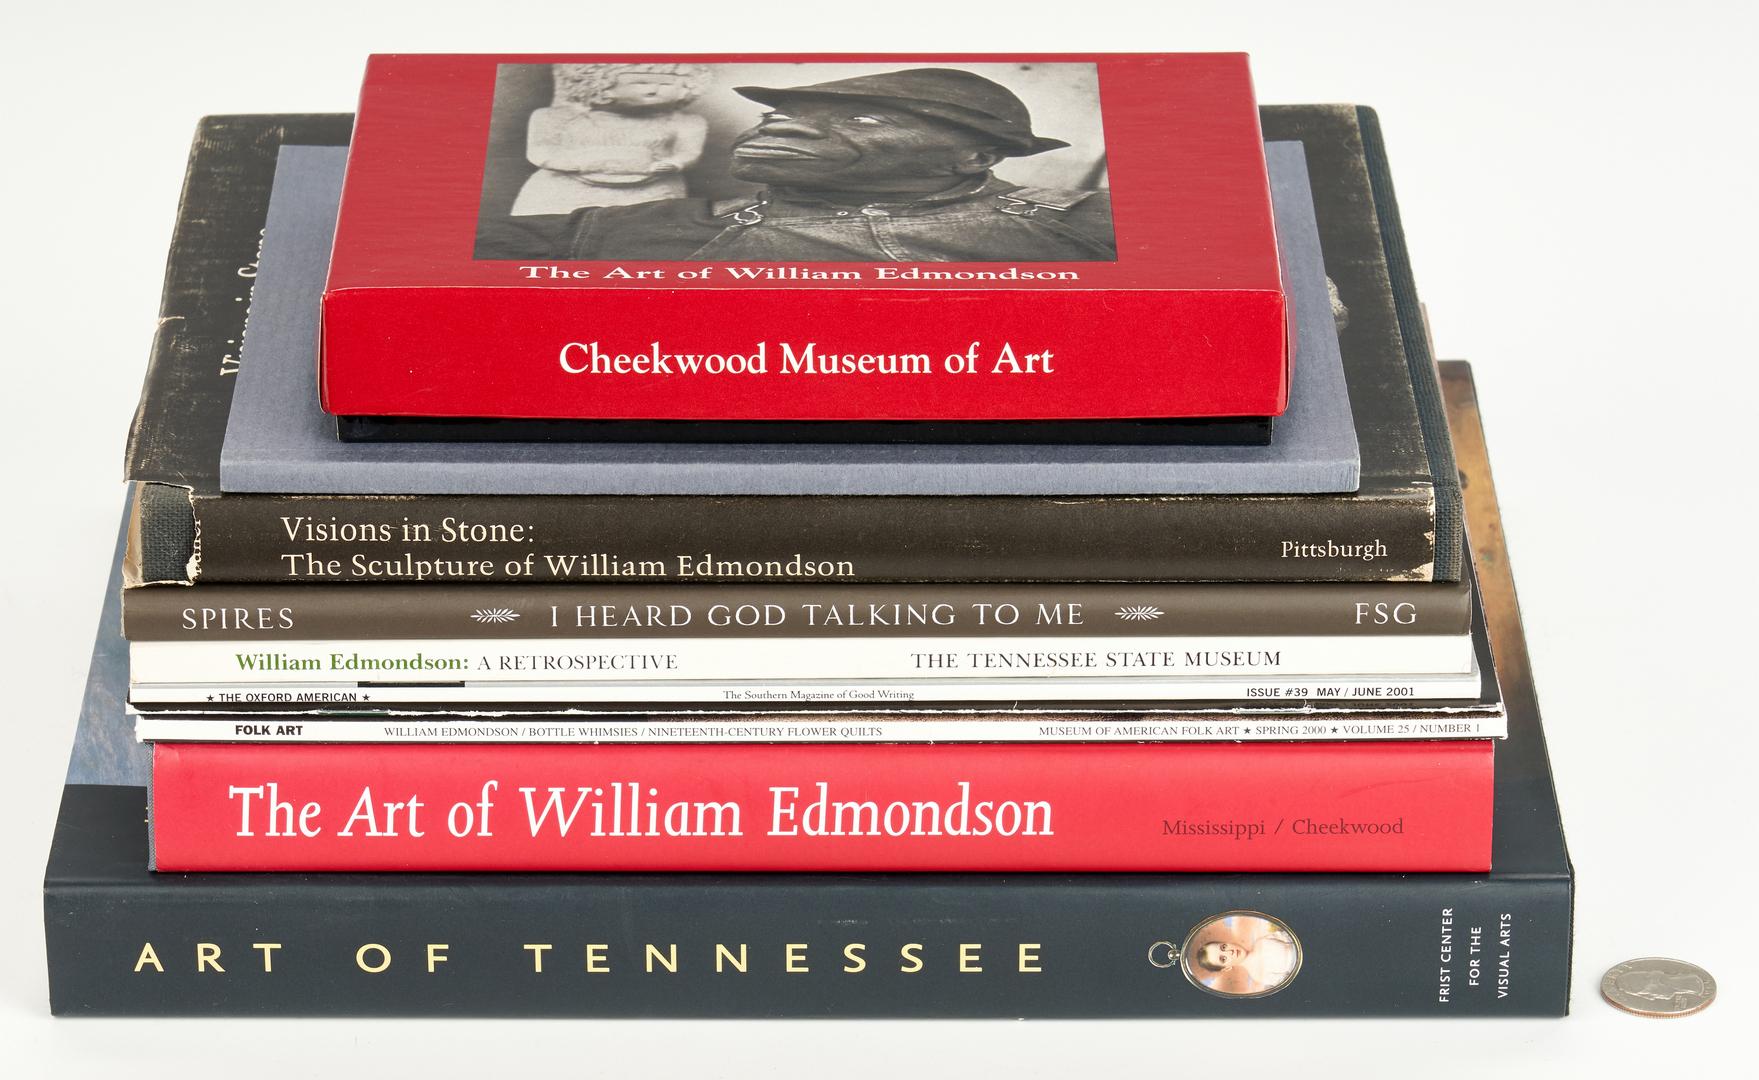 Lot 127: 10 William Edmondson Books, Exhibition Catalogs, & More